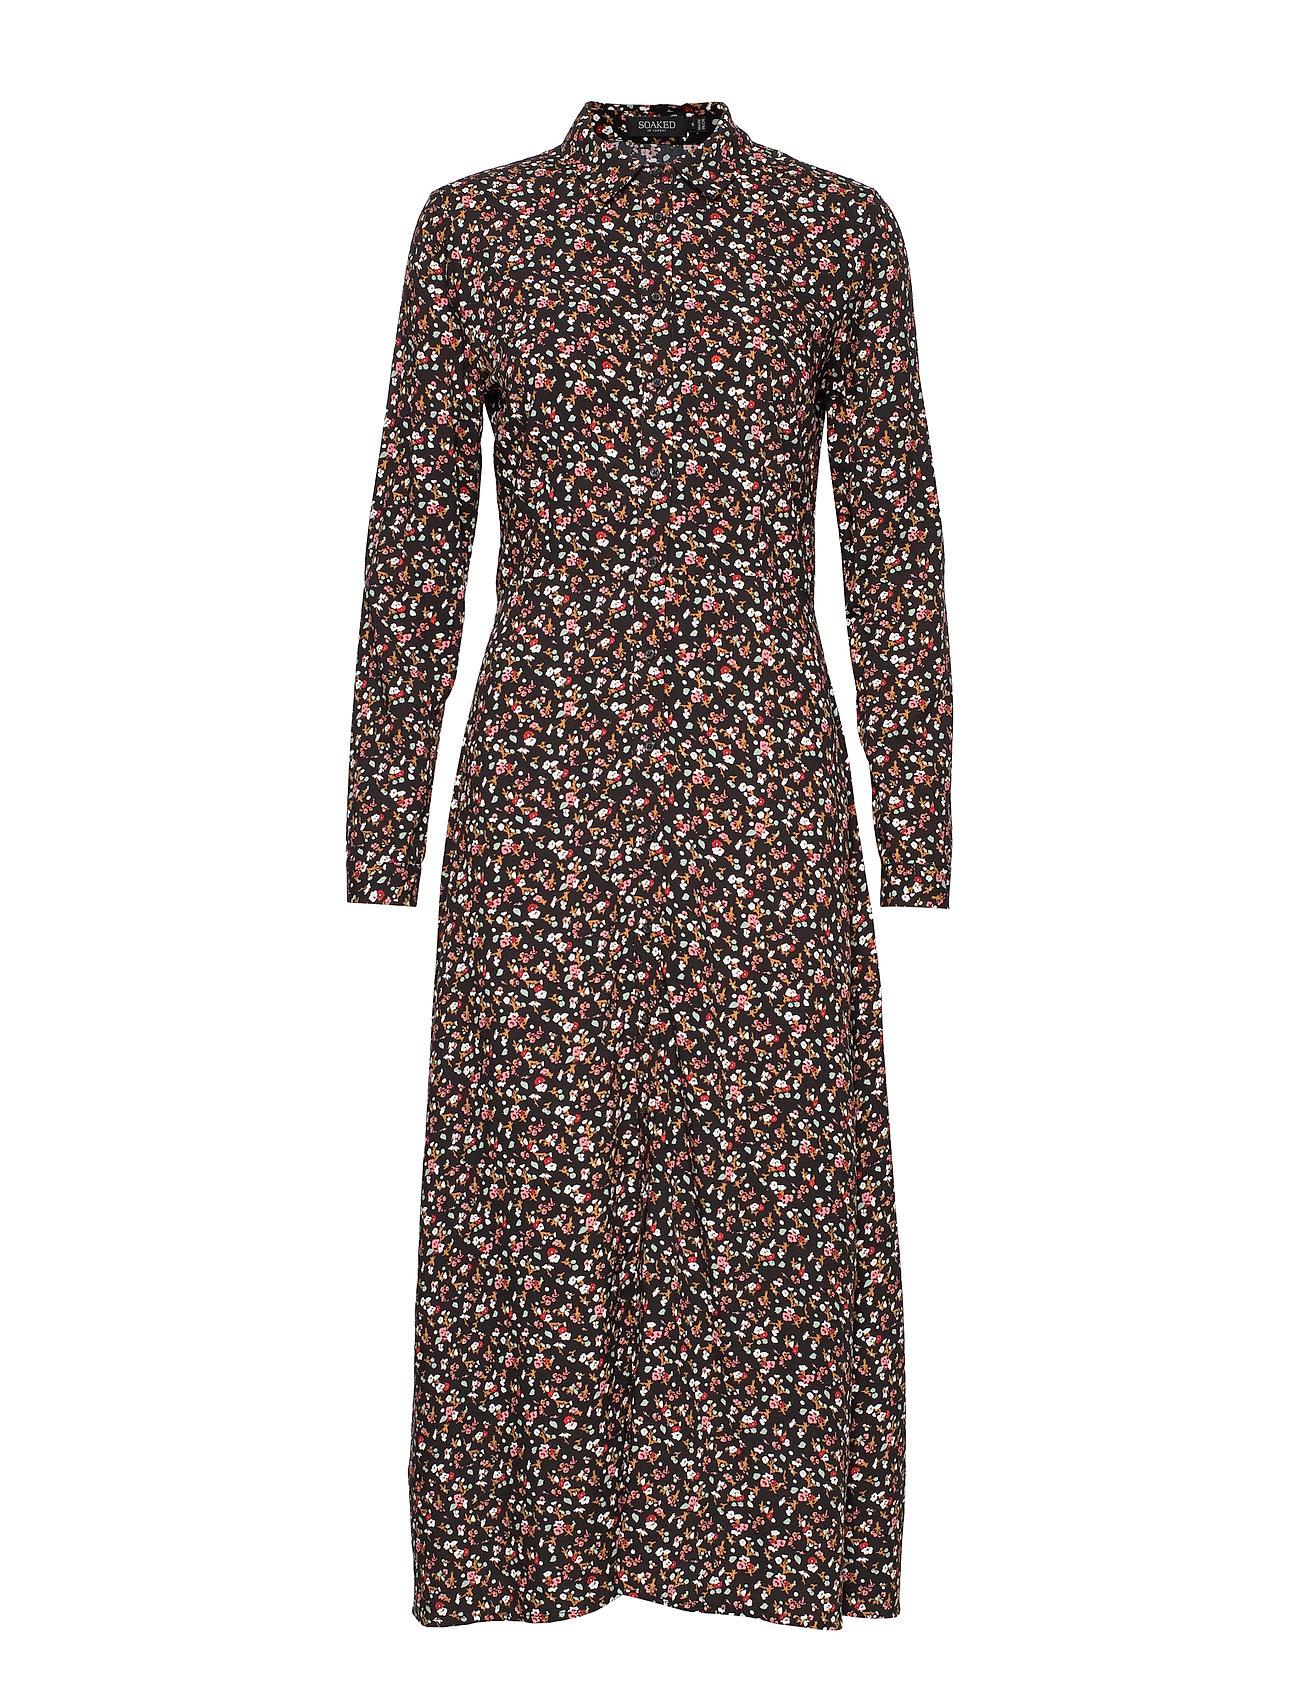 Soaked in Luxury SL Alva Oda Shirt Dress - BLACK MINI FLOWERS